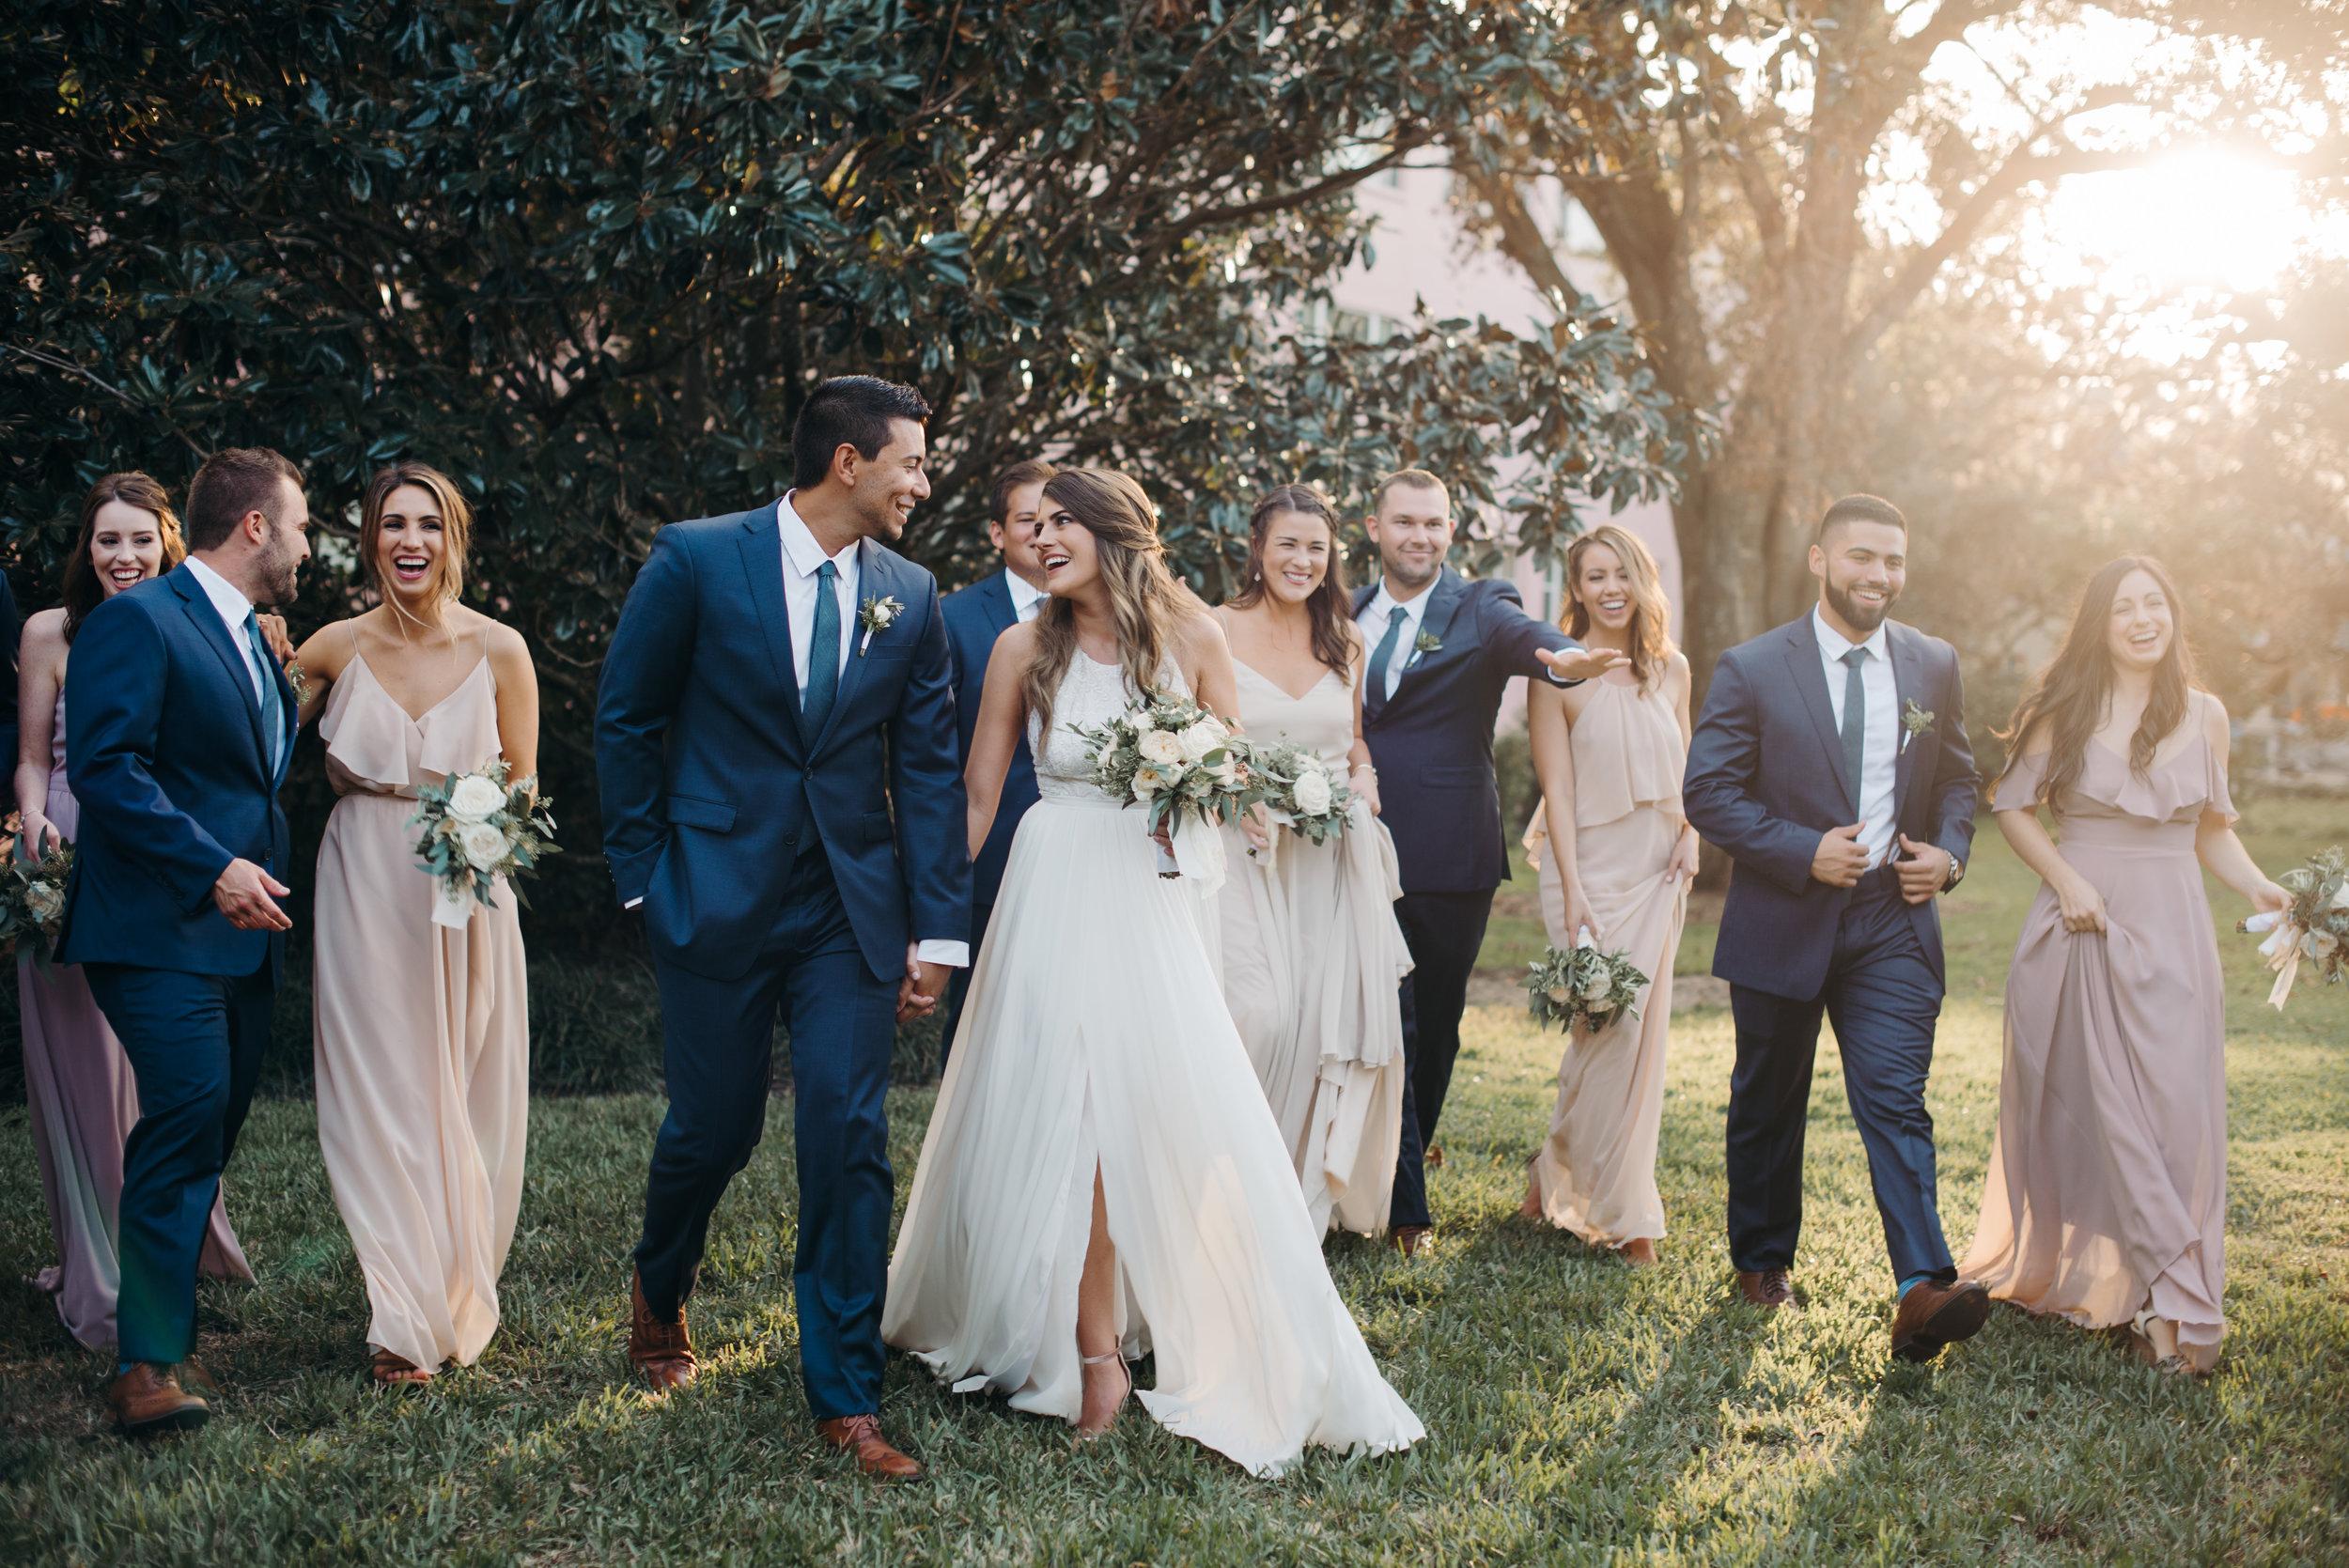 randy-sarah-fontanez-casa-feliz-winter-park-orlando-wedding-photography-261.jpg